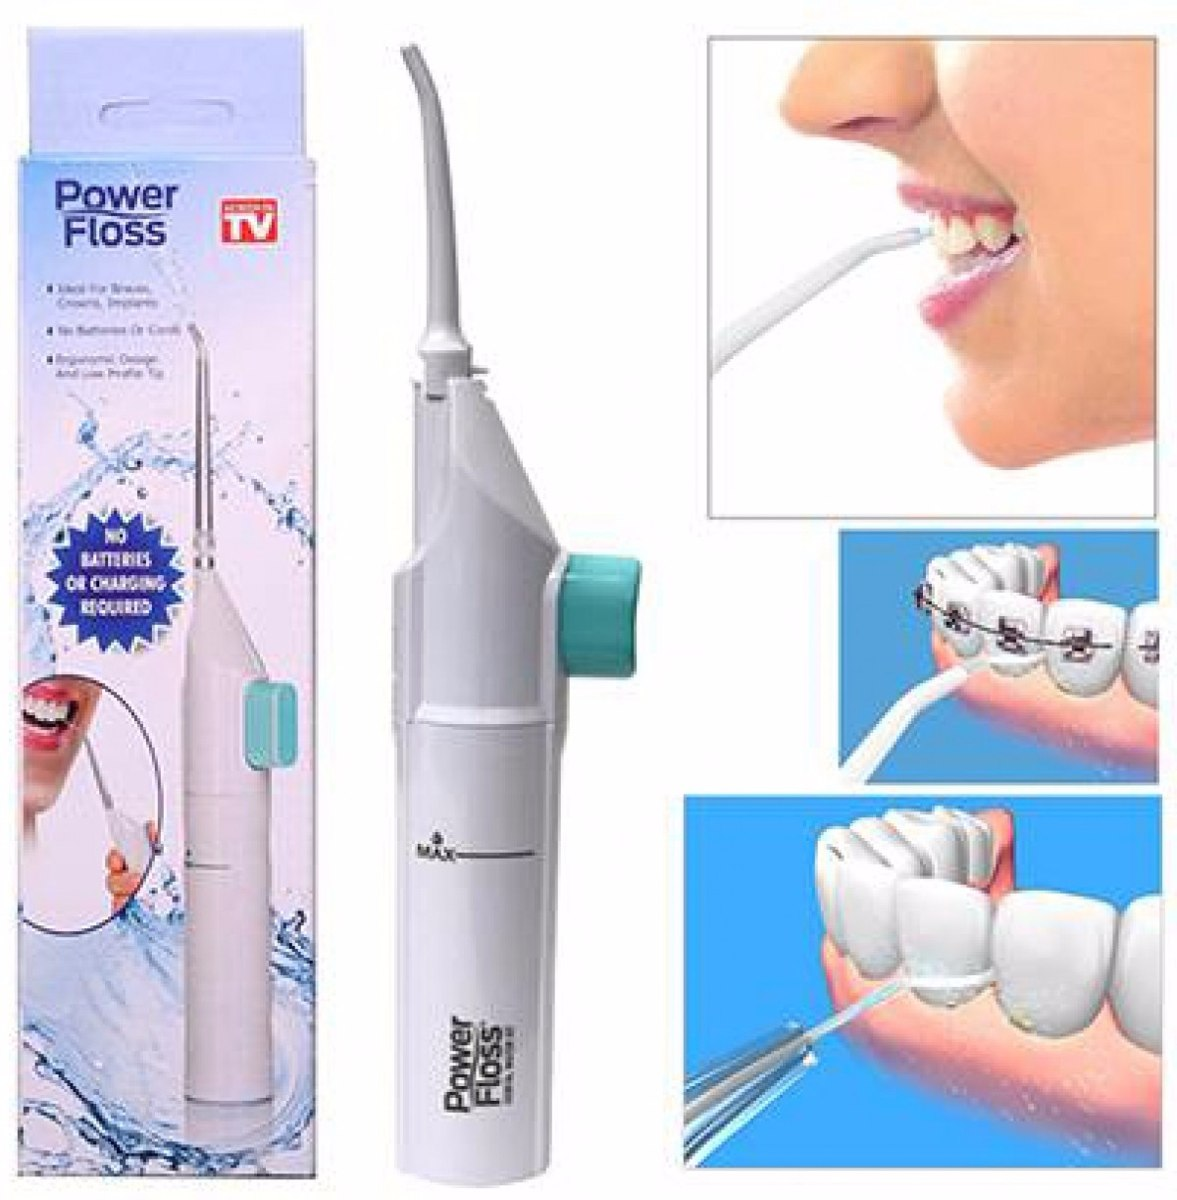 edfc9b4c6 Dental Power Floss Jato De Agua Limpeza Oral Tipo Waterpik - R  26 ...